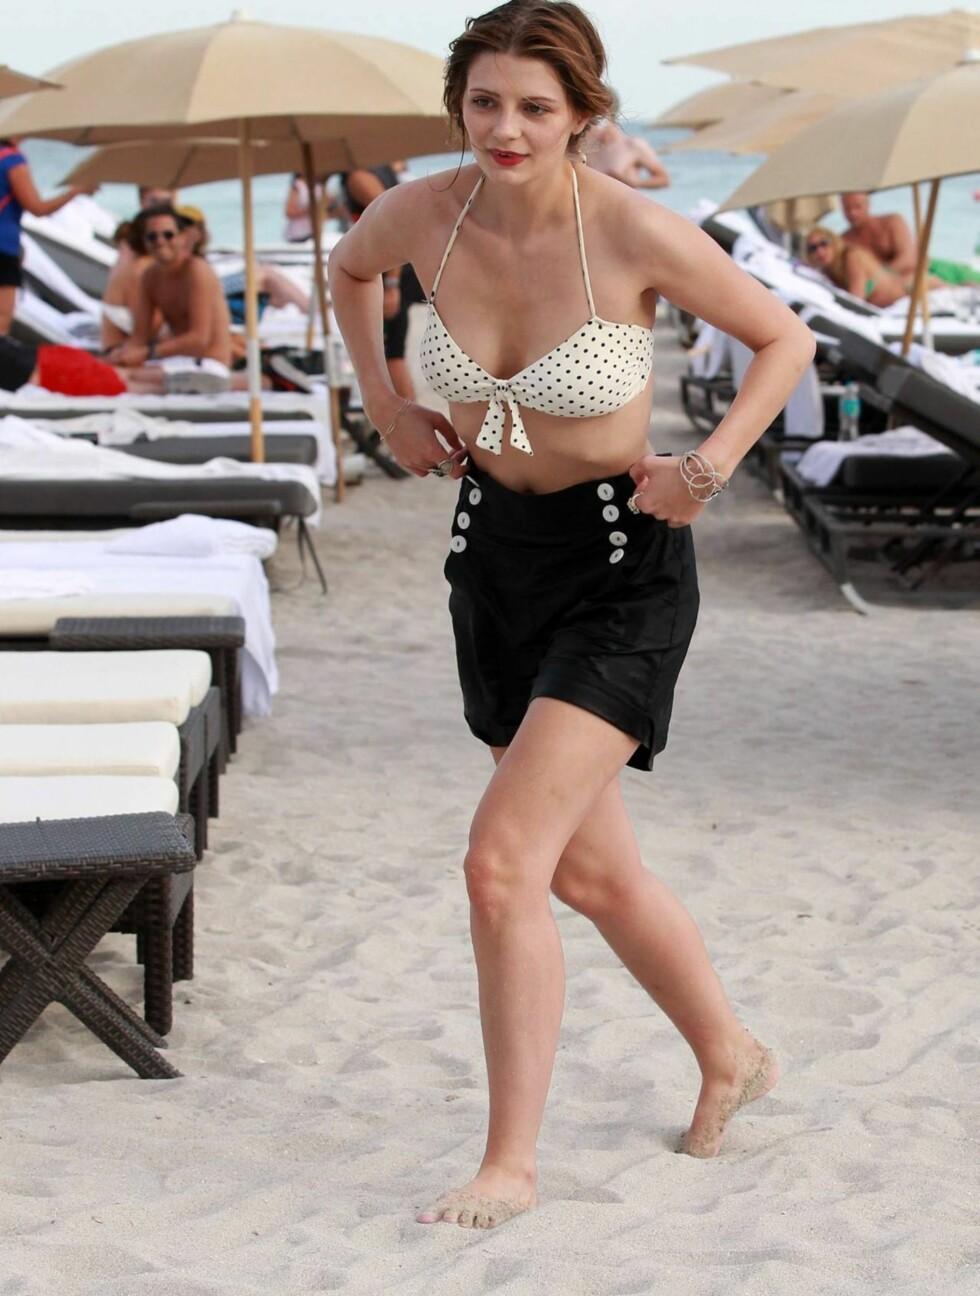 STRÅLER: Mischa Barton minner igjen om jenta som ble verdensberømt i rollen som Marissa Cooper i TV-serien «The O.C.». Foto: All Over Press